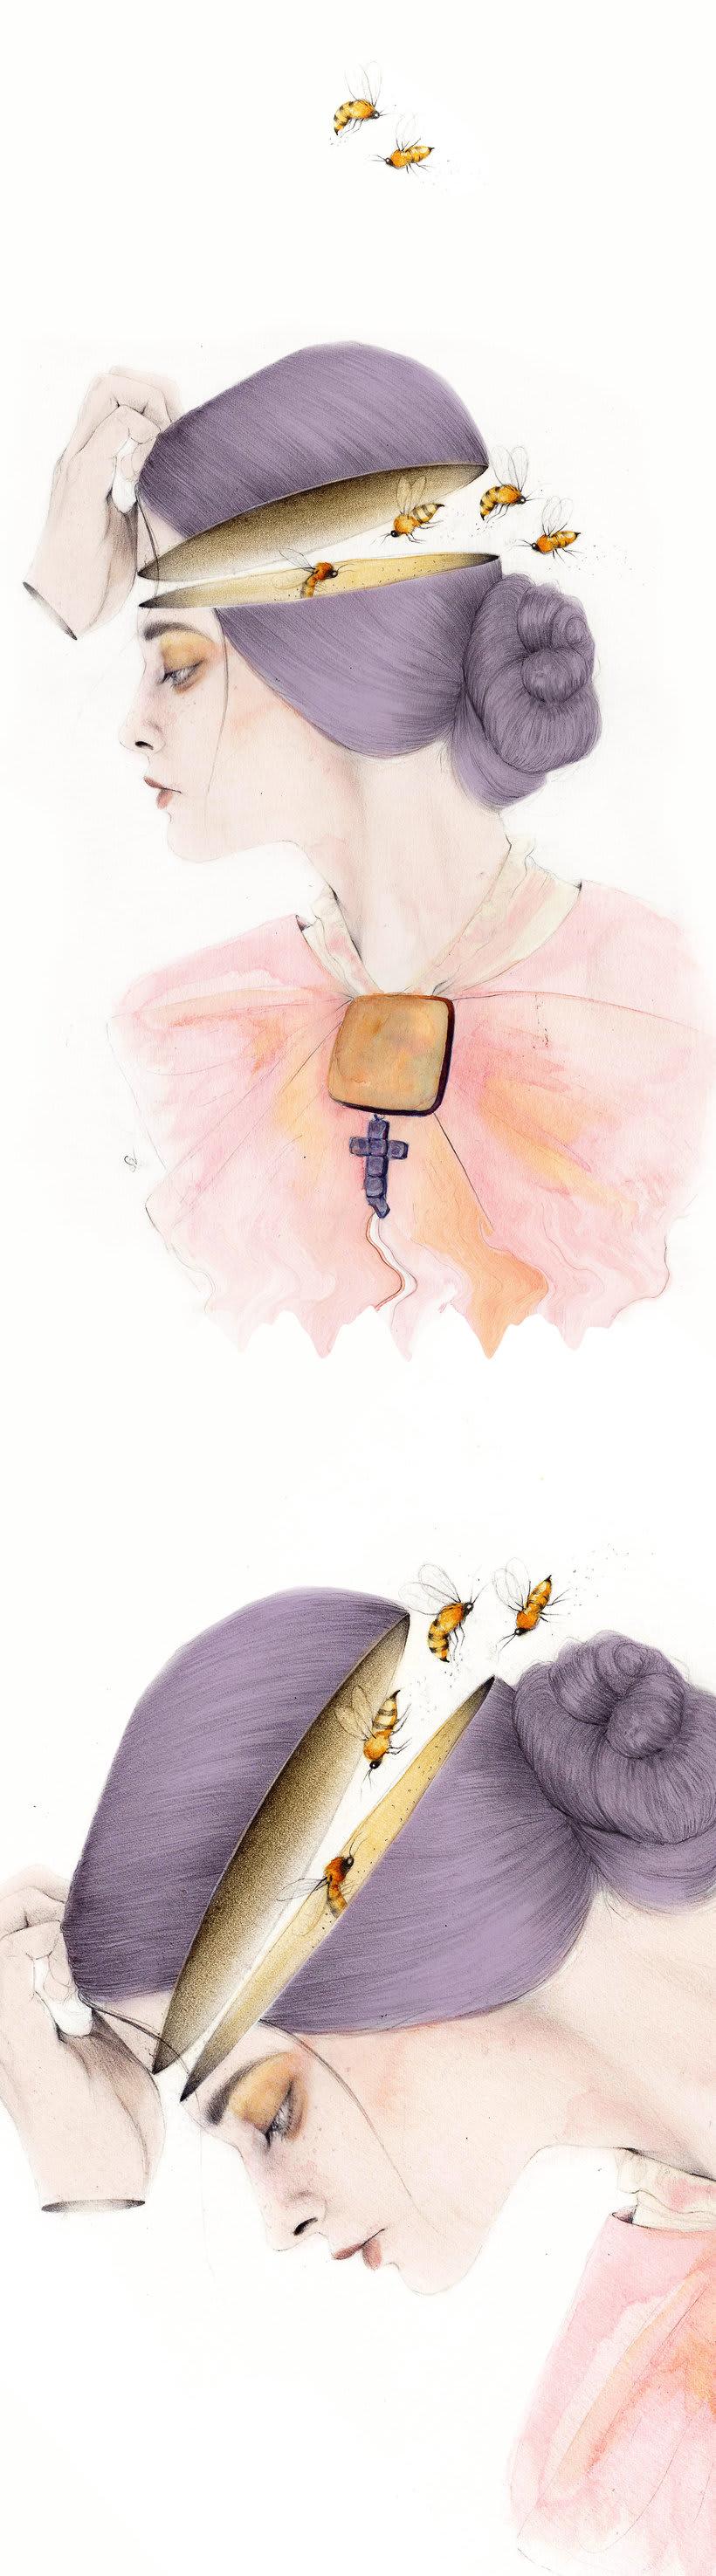 Gucci Bees -1